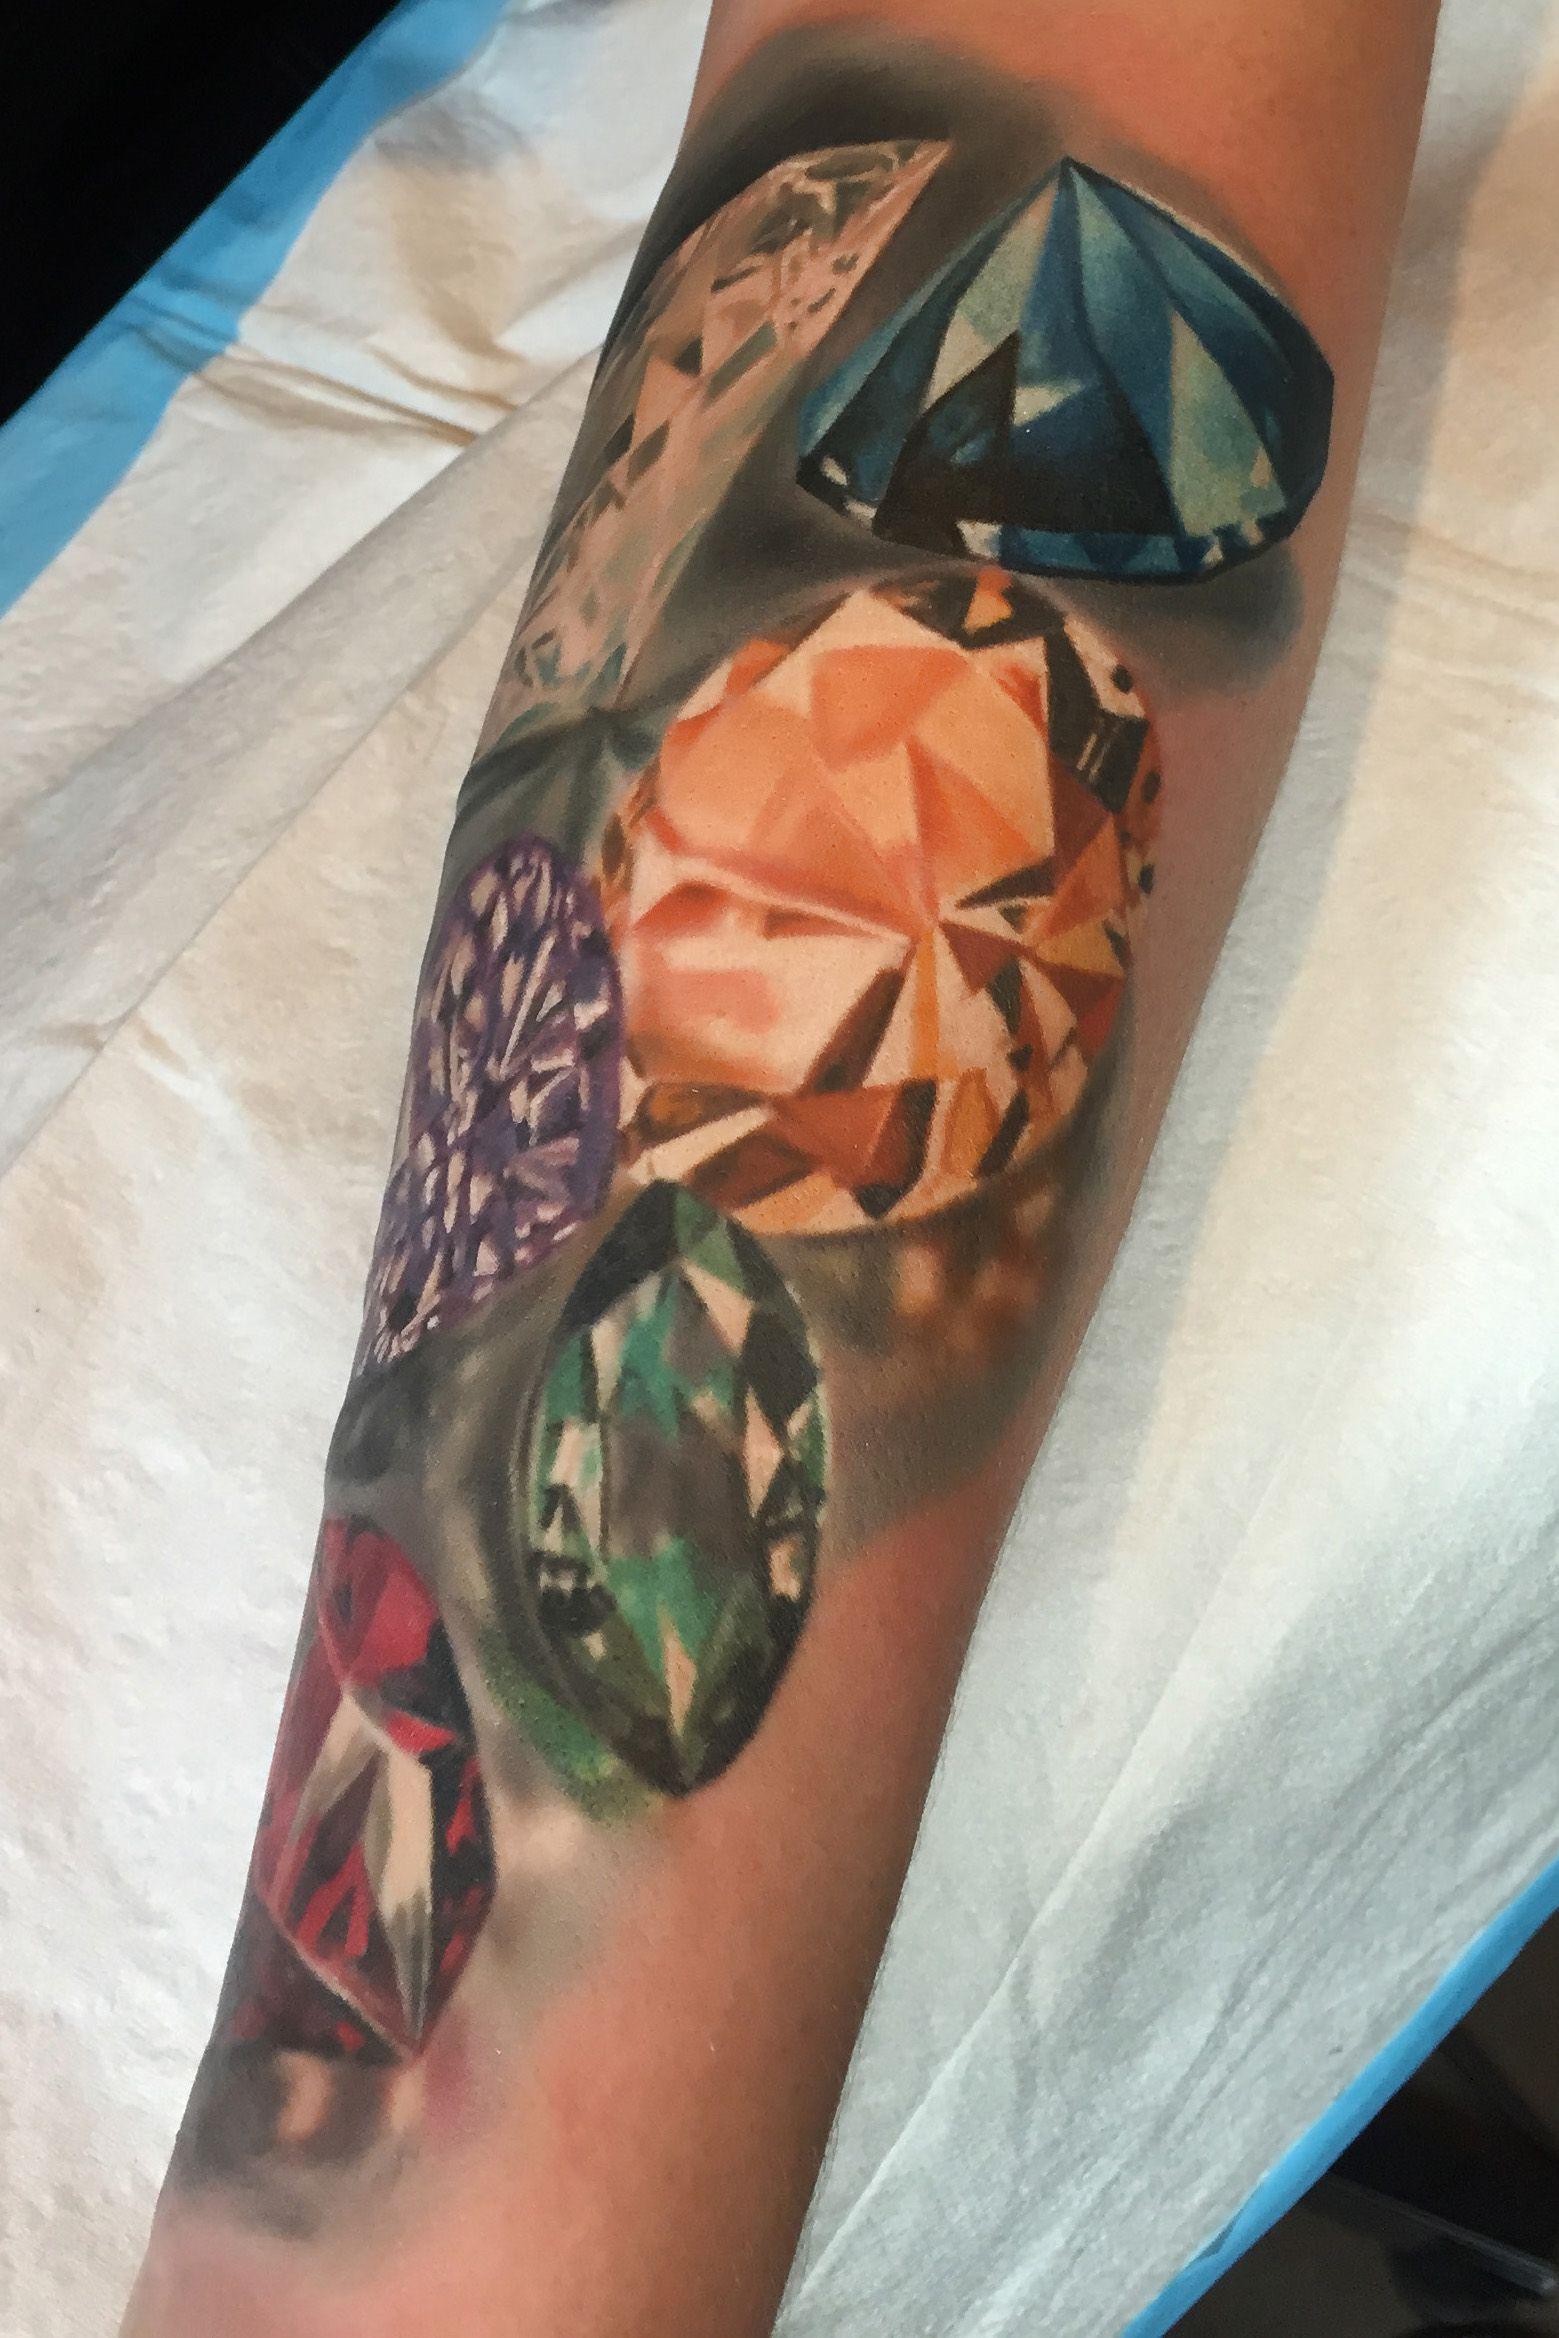 Realistic Gems Tattoo By Monte Livingston At Living Art Gallery Tattoo Lounge In San Clemente Ca Diamondtattoos Gemta Gem Tattoo Pearl Tattoo Tattoo Lounge